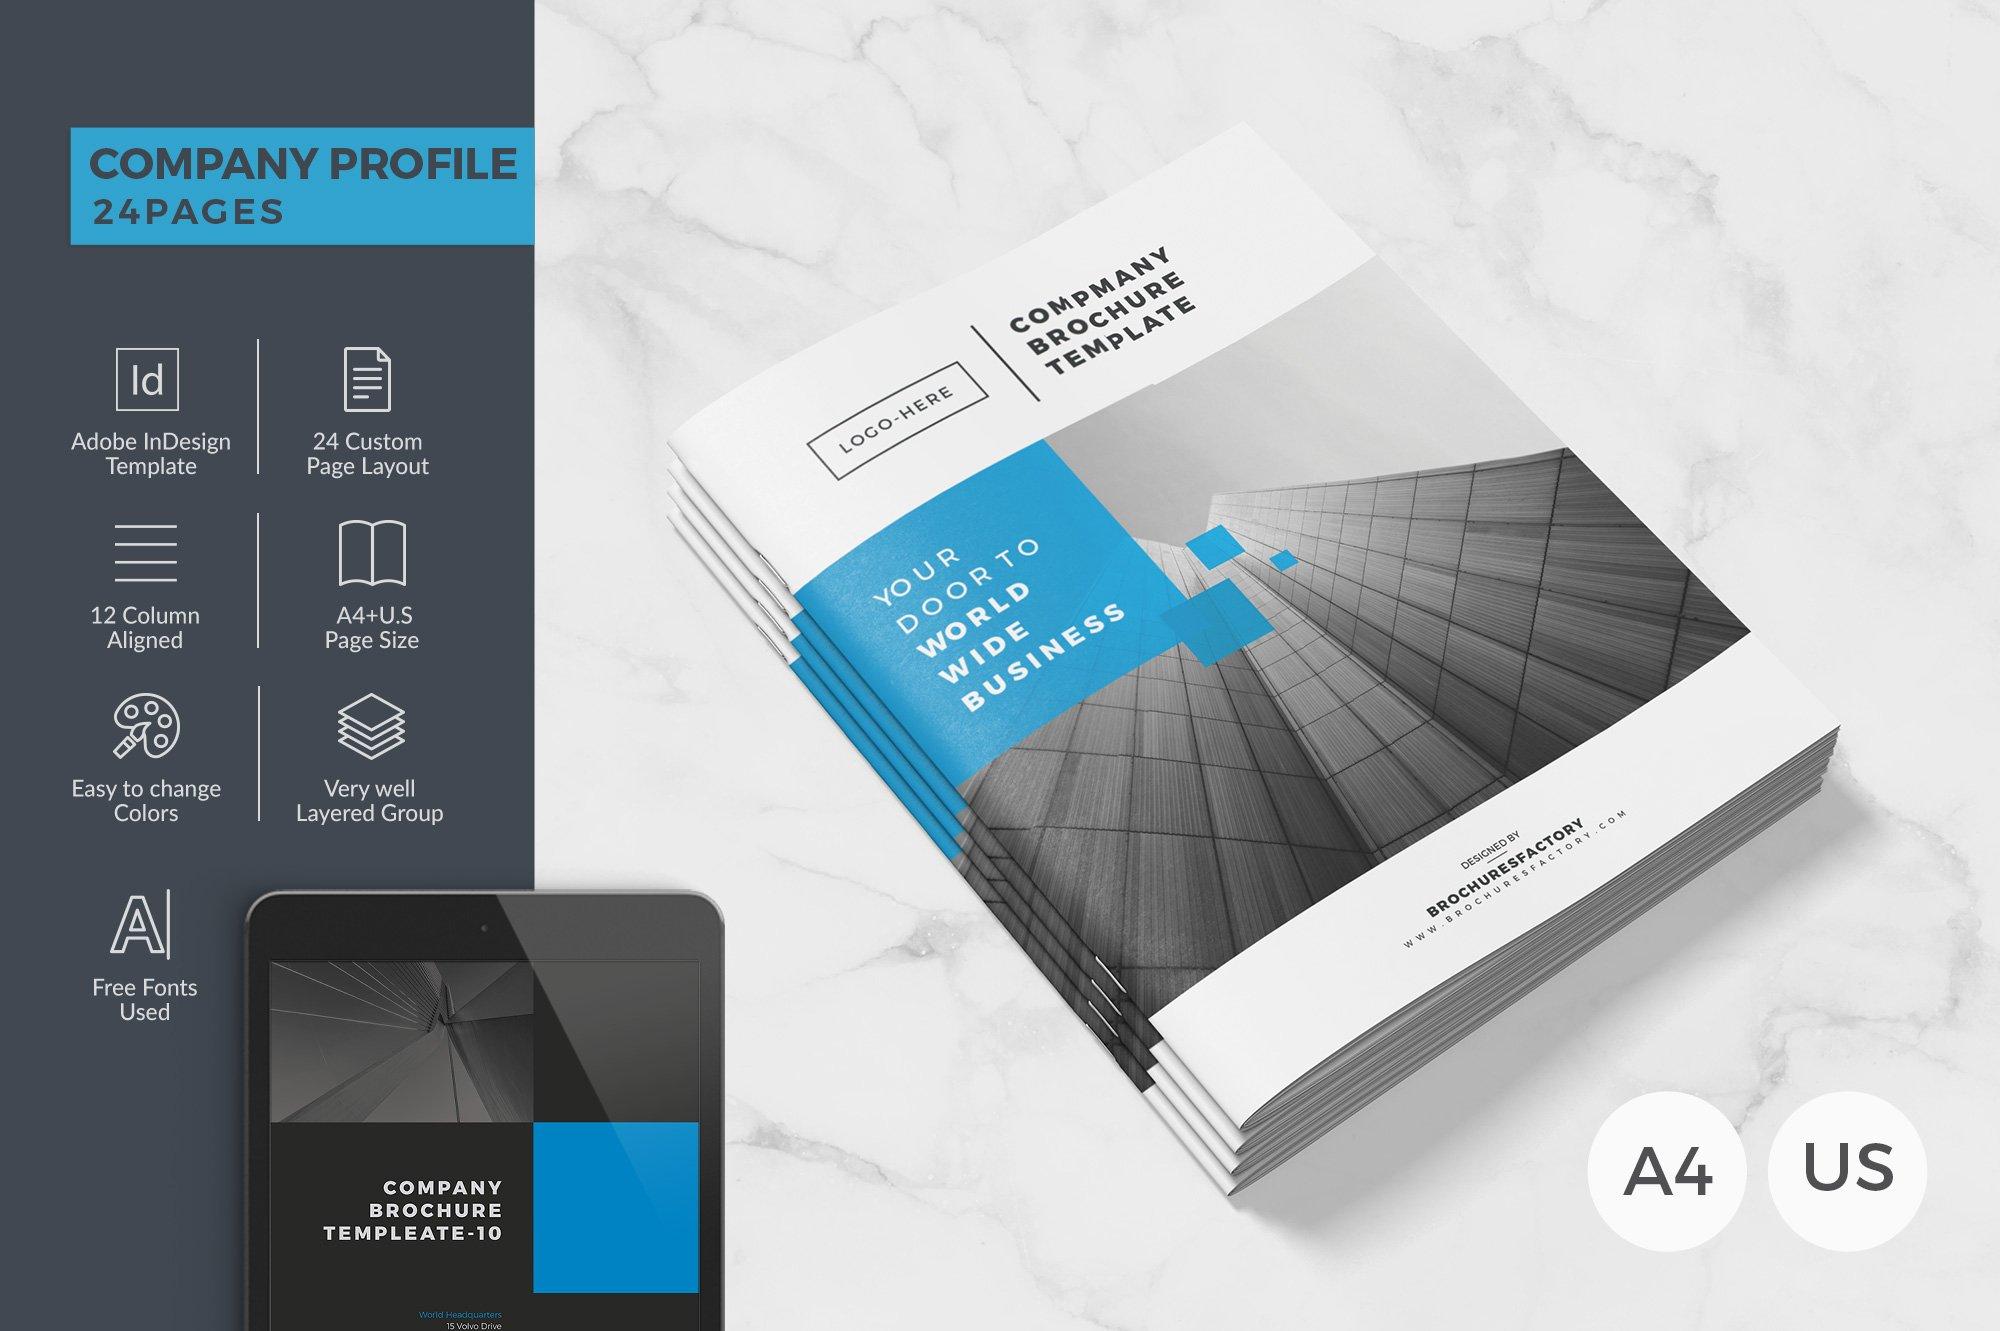 Company Brochure 24 Pages Brochure Templates Creative Market